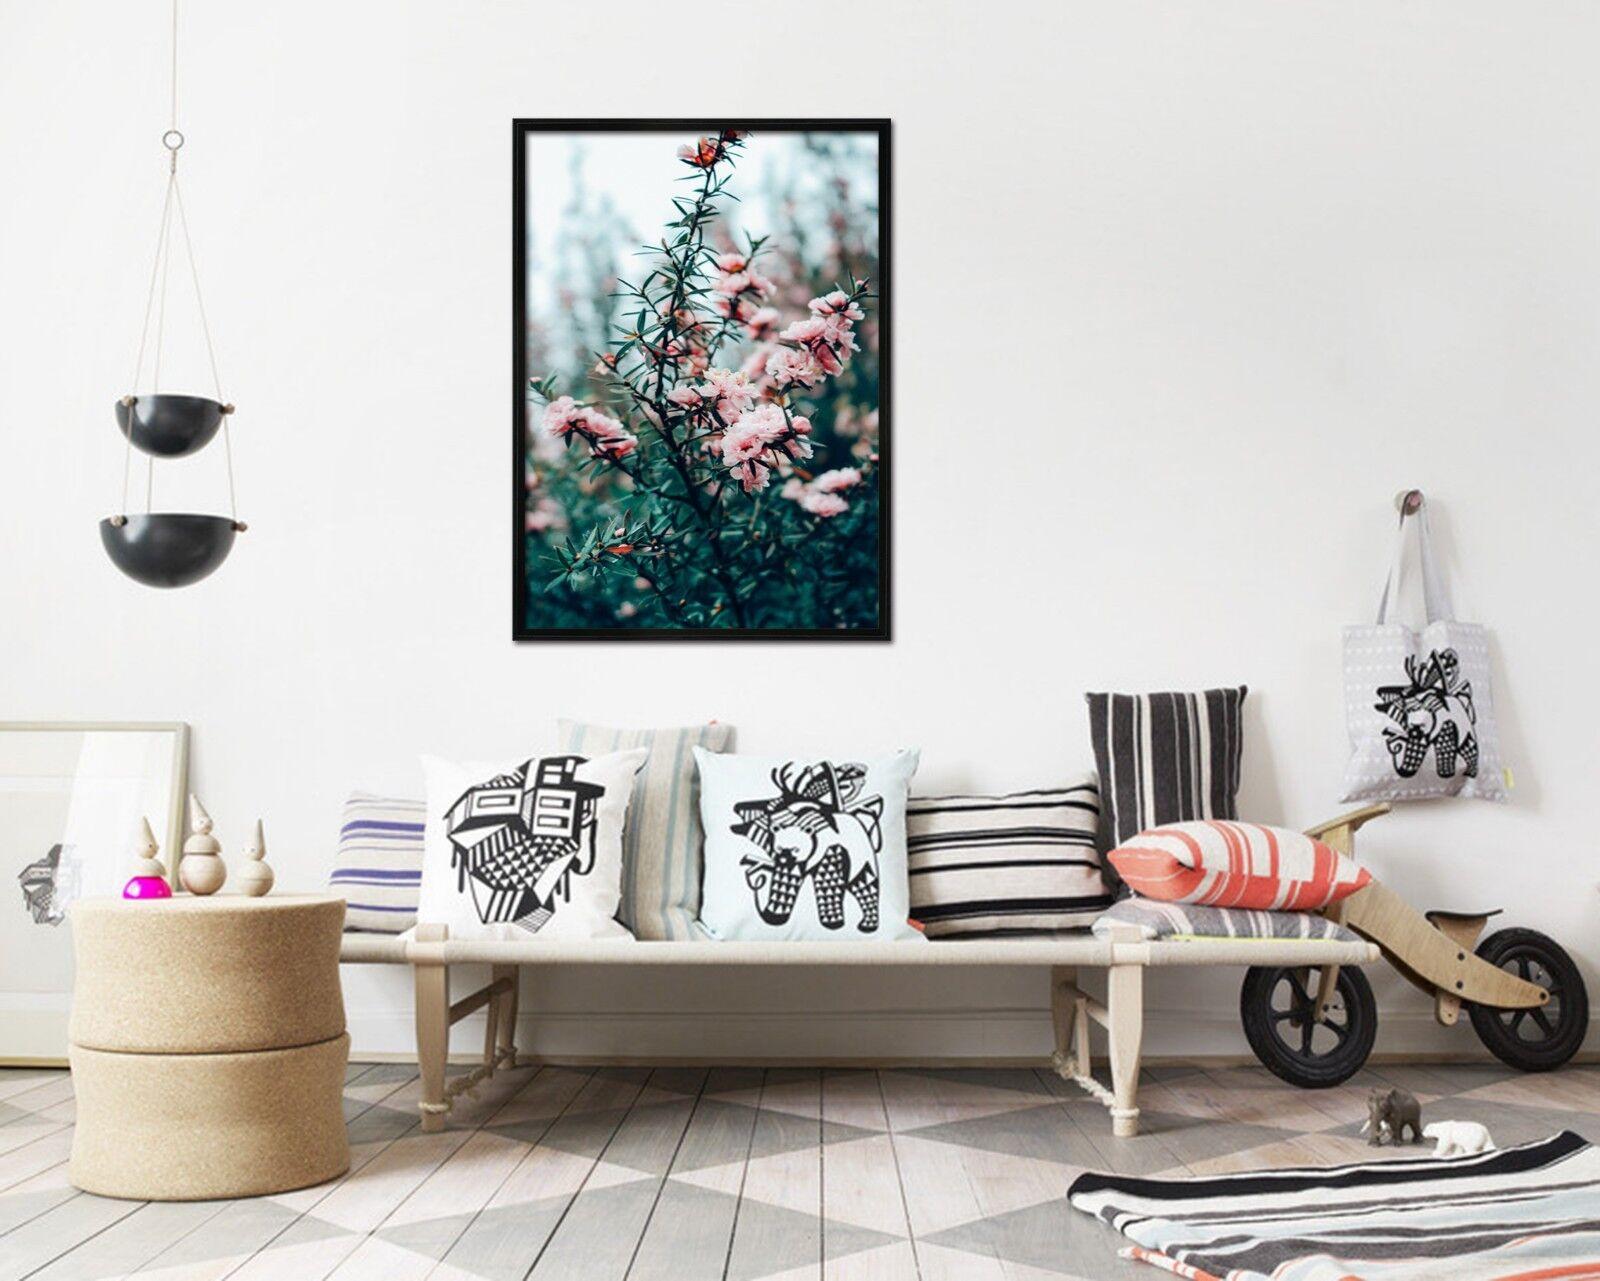 3D Blaumen Baum Niederlassung 3 Gerahmt Poster Daheim Dekor Drucken Malerei Kunst